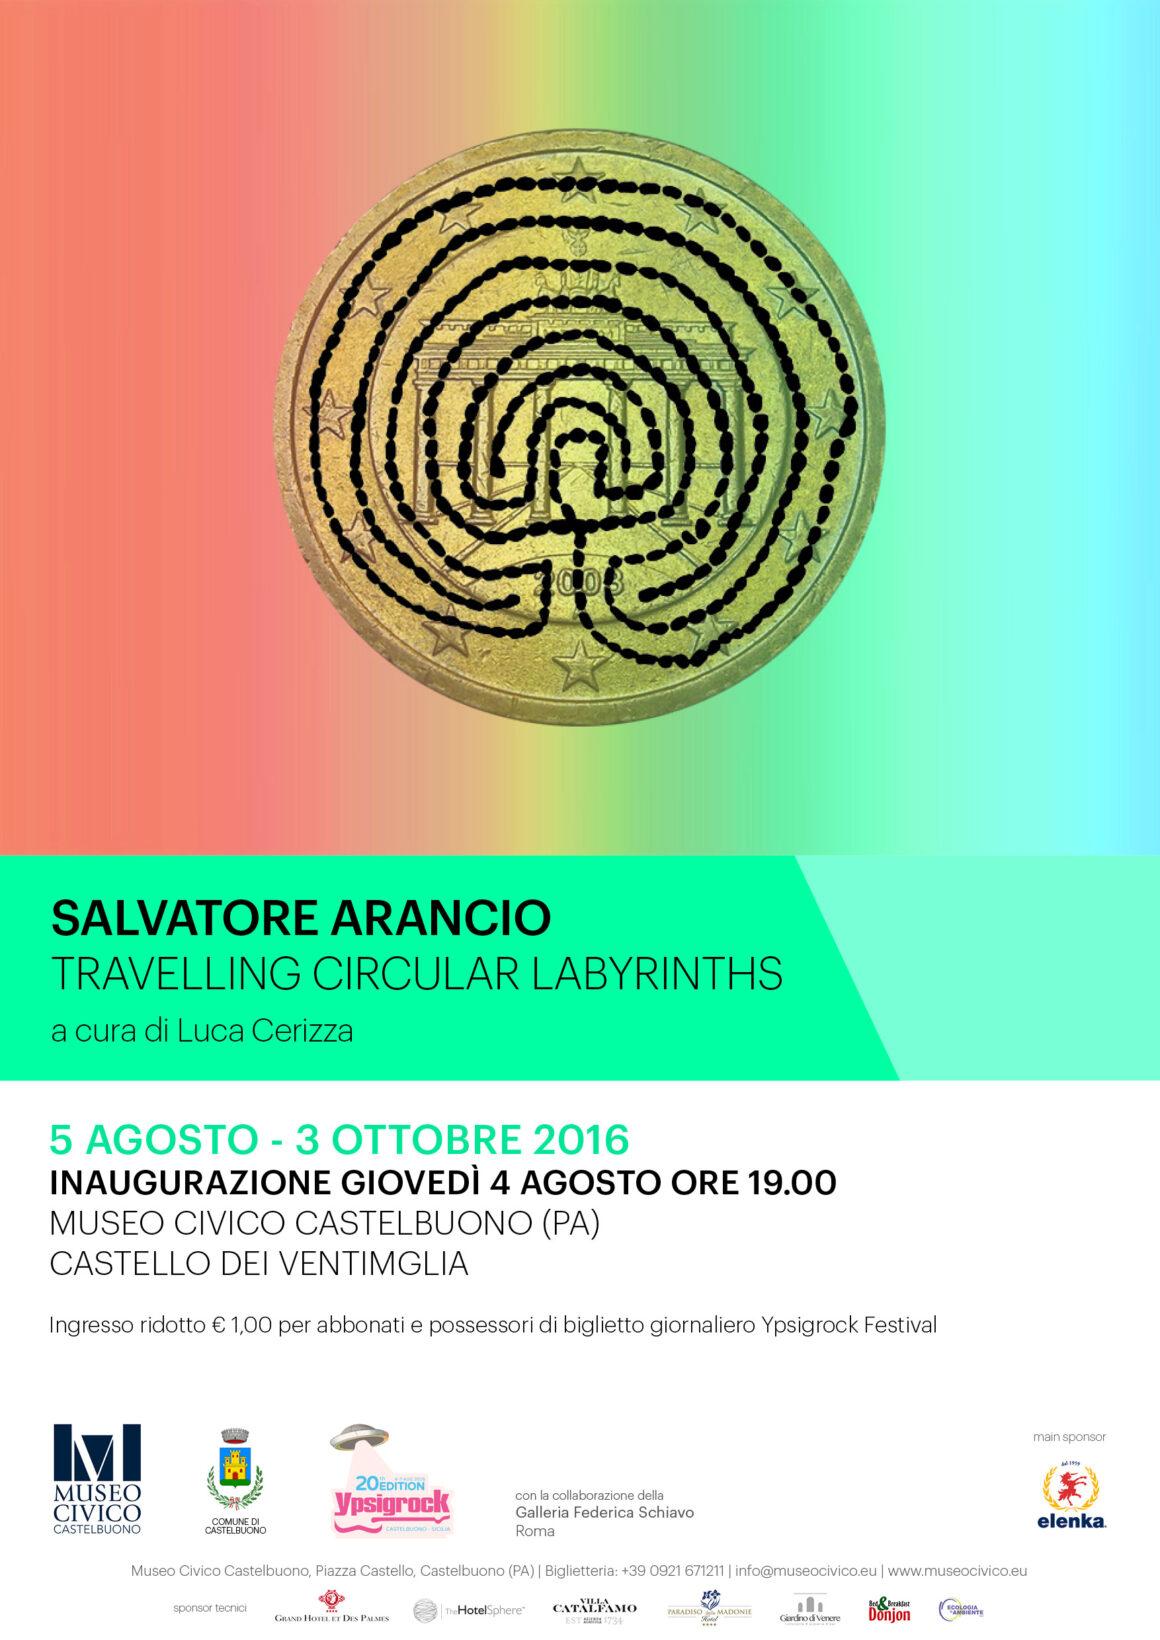 TRAVELLING CIRCULAR LABYRINTHS – Salvatore Arancio a cura di Luca Cerizza